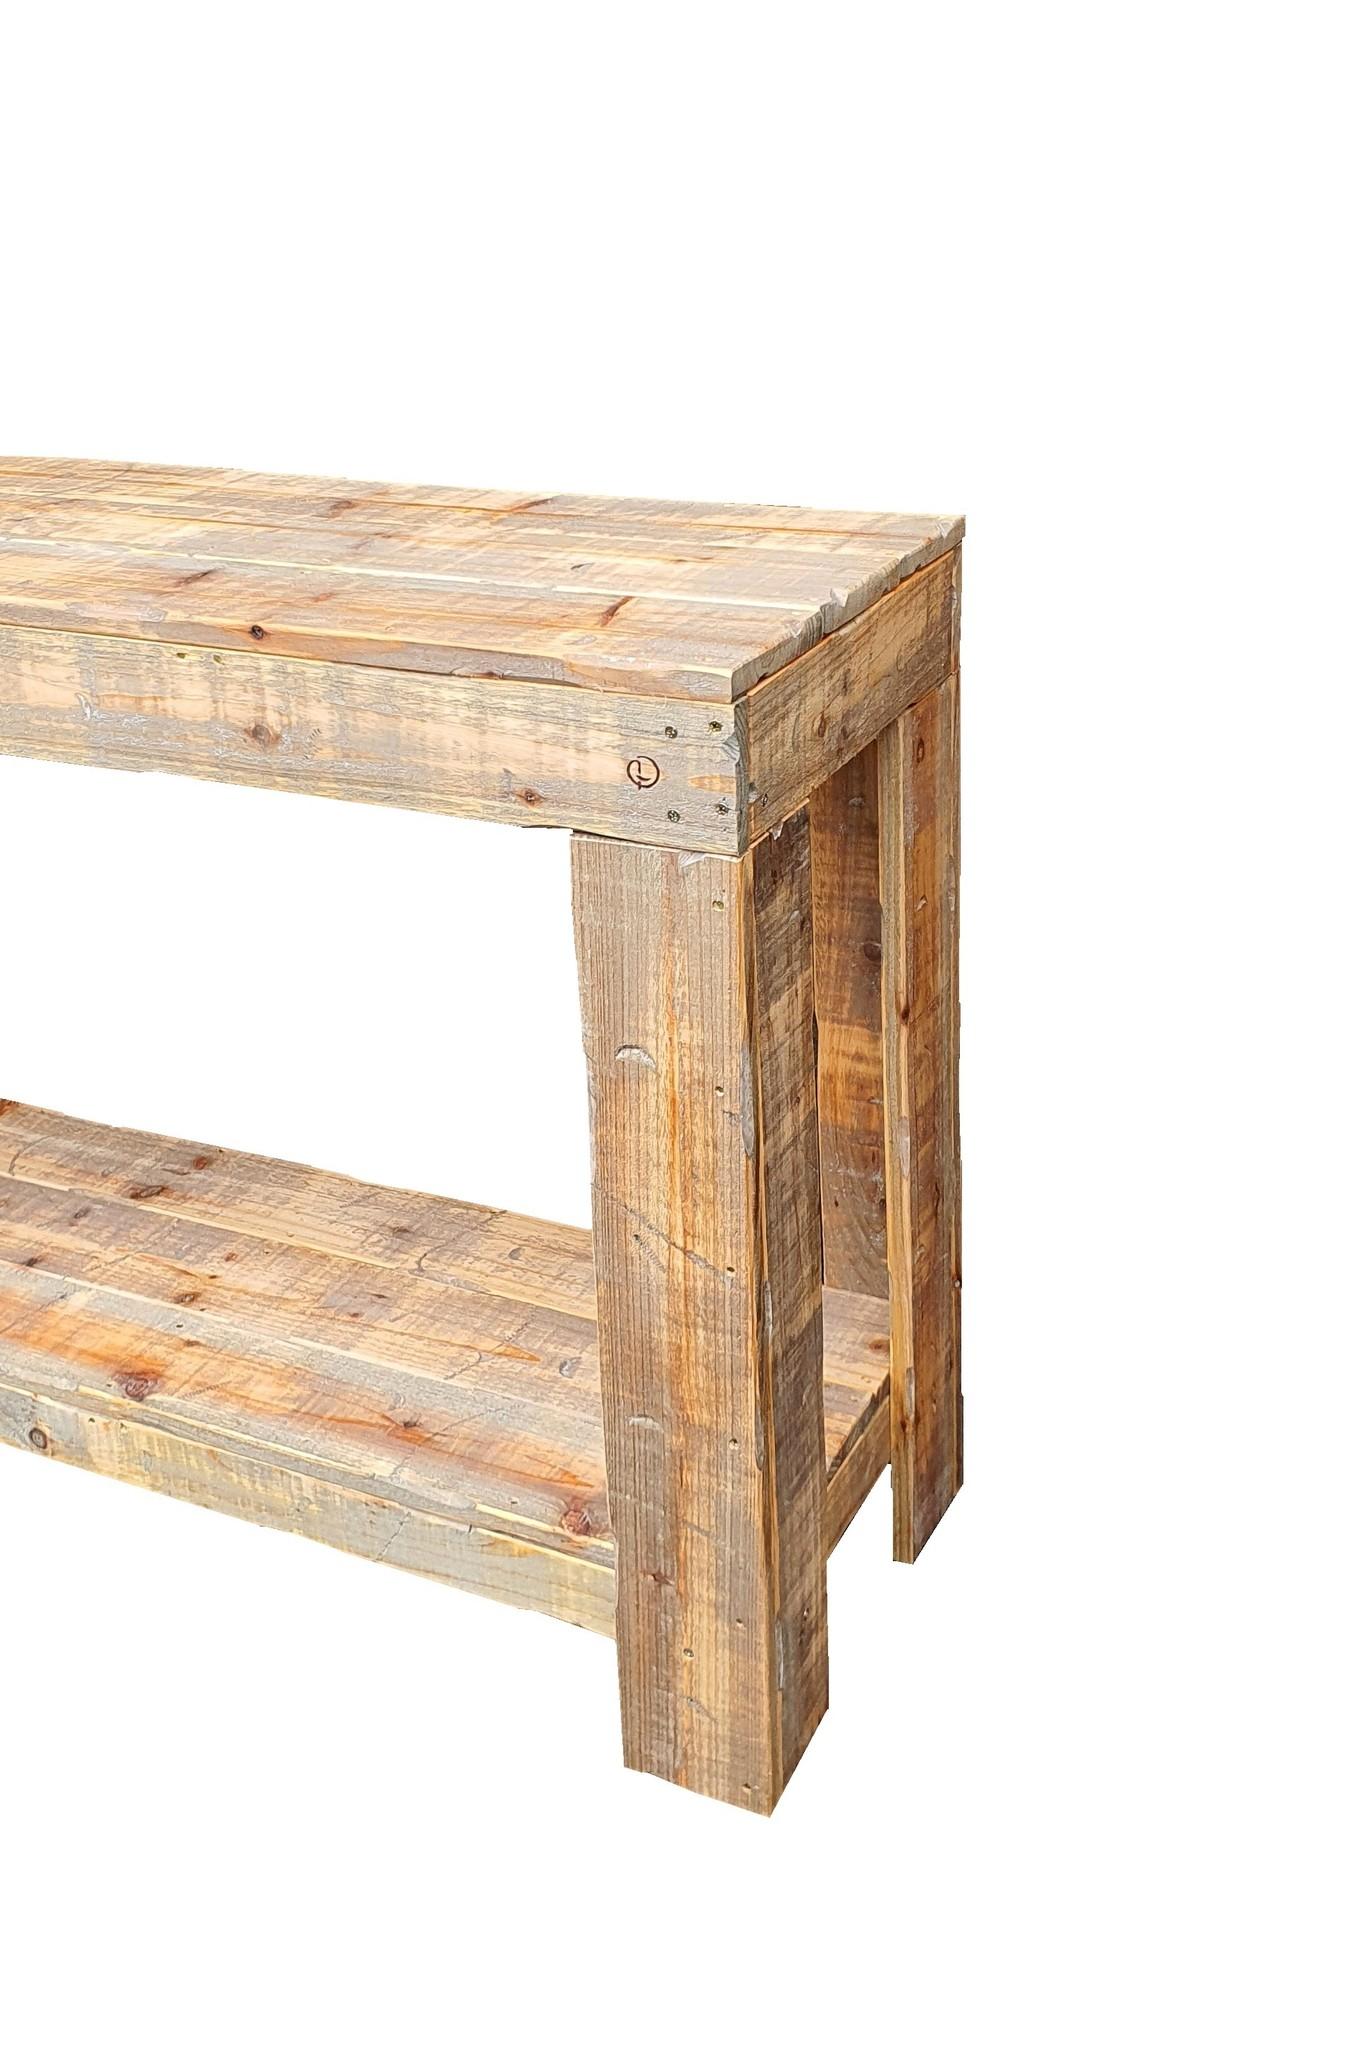 shop int dutch dark table double 110/39-1